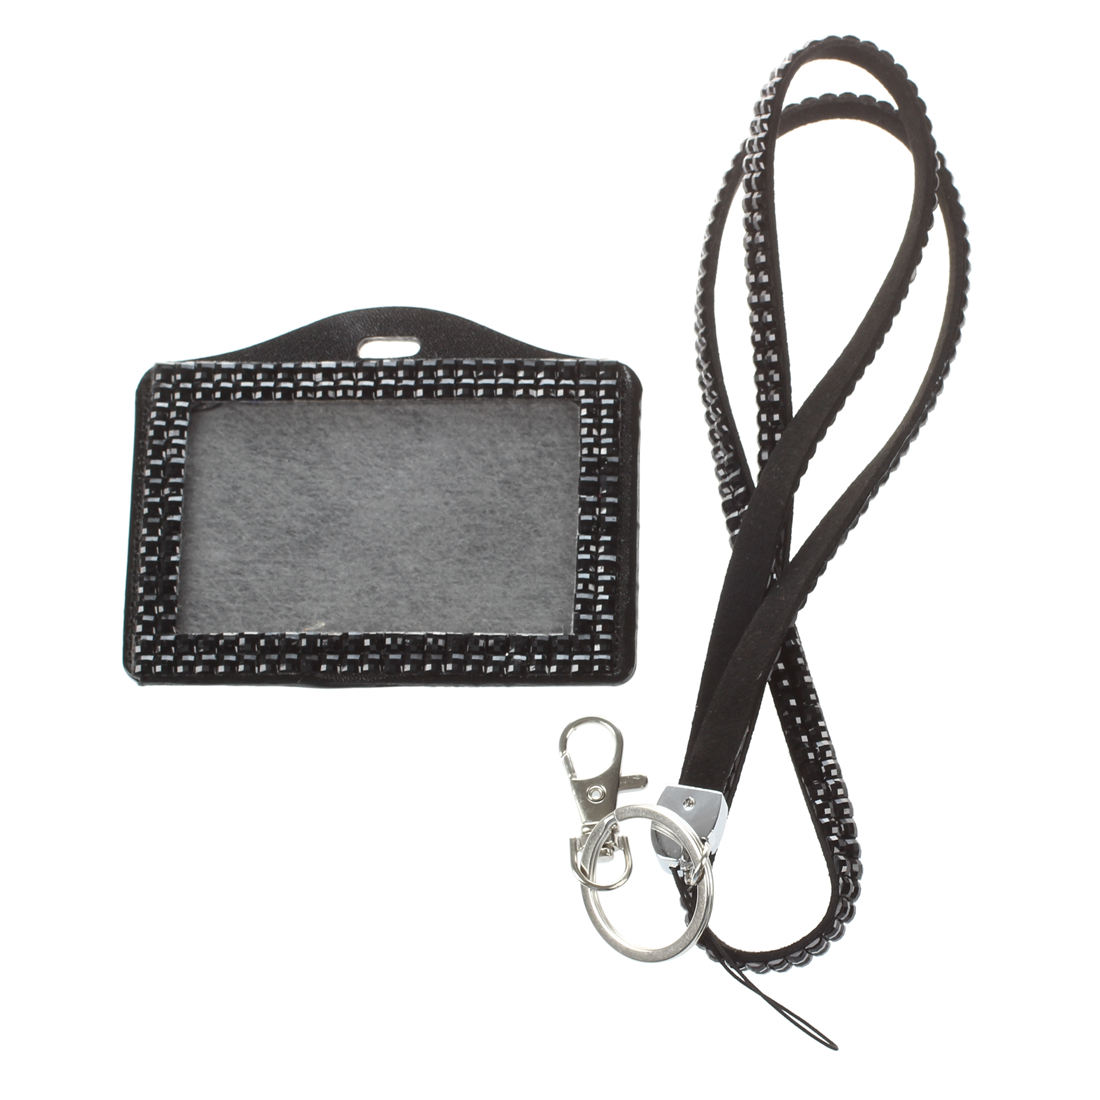 Luggage & Bags Nice Fggs-horizontal Resin Rhinestone Work Card Id Case Holder Lanyard Sling High Quality Materials